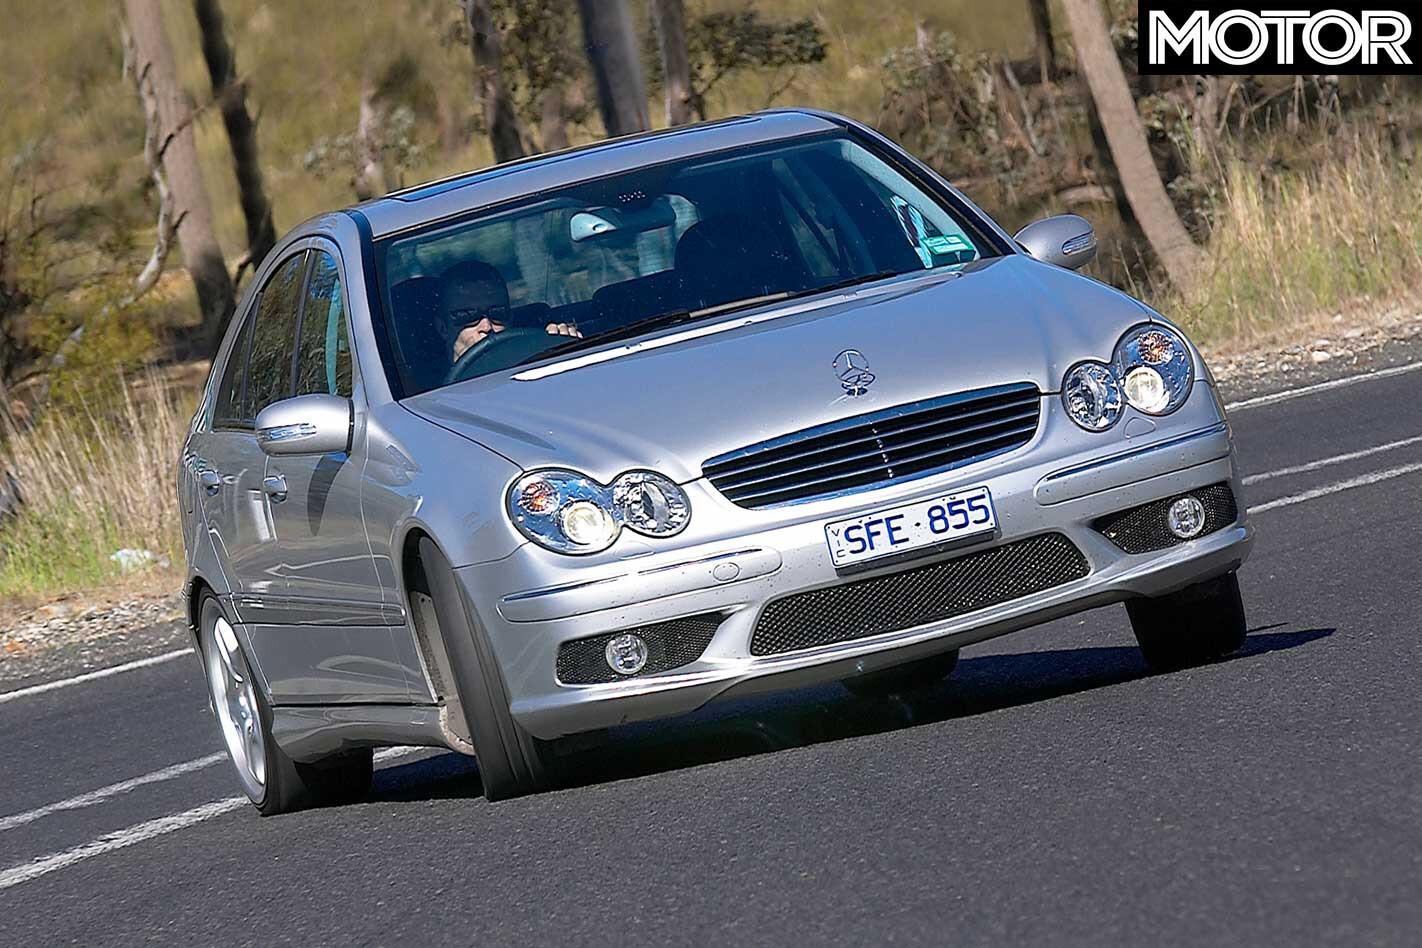 2005 Mercedes Benz C 55 AMG Handling Jpg